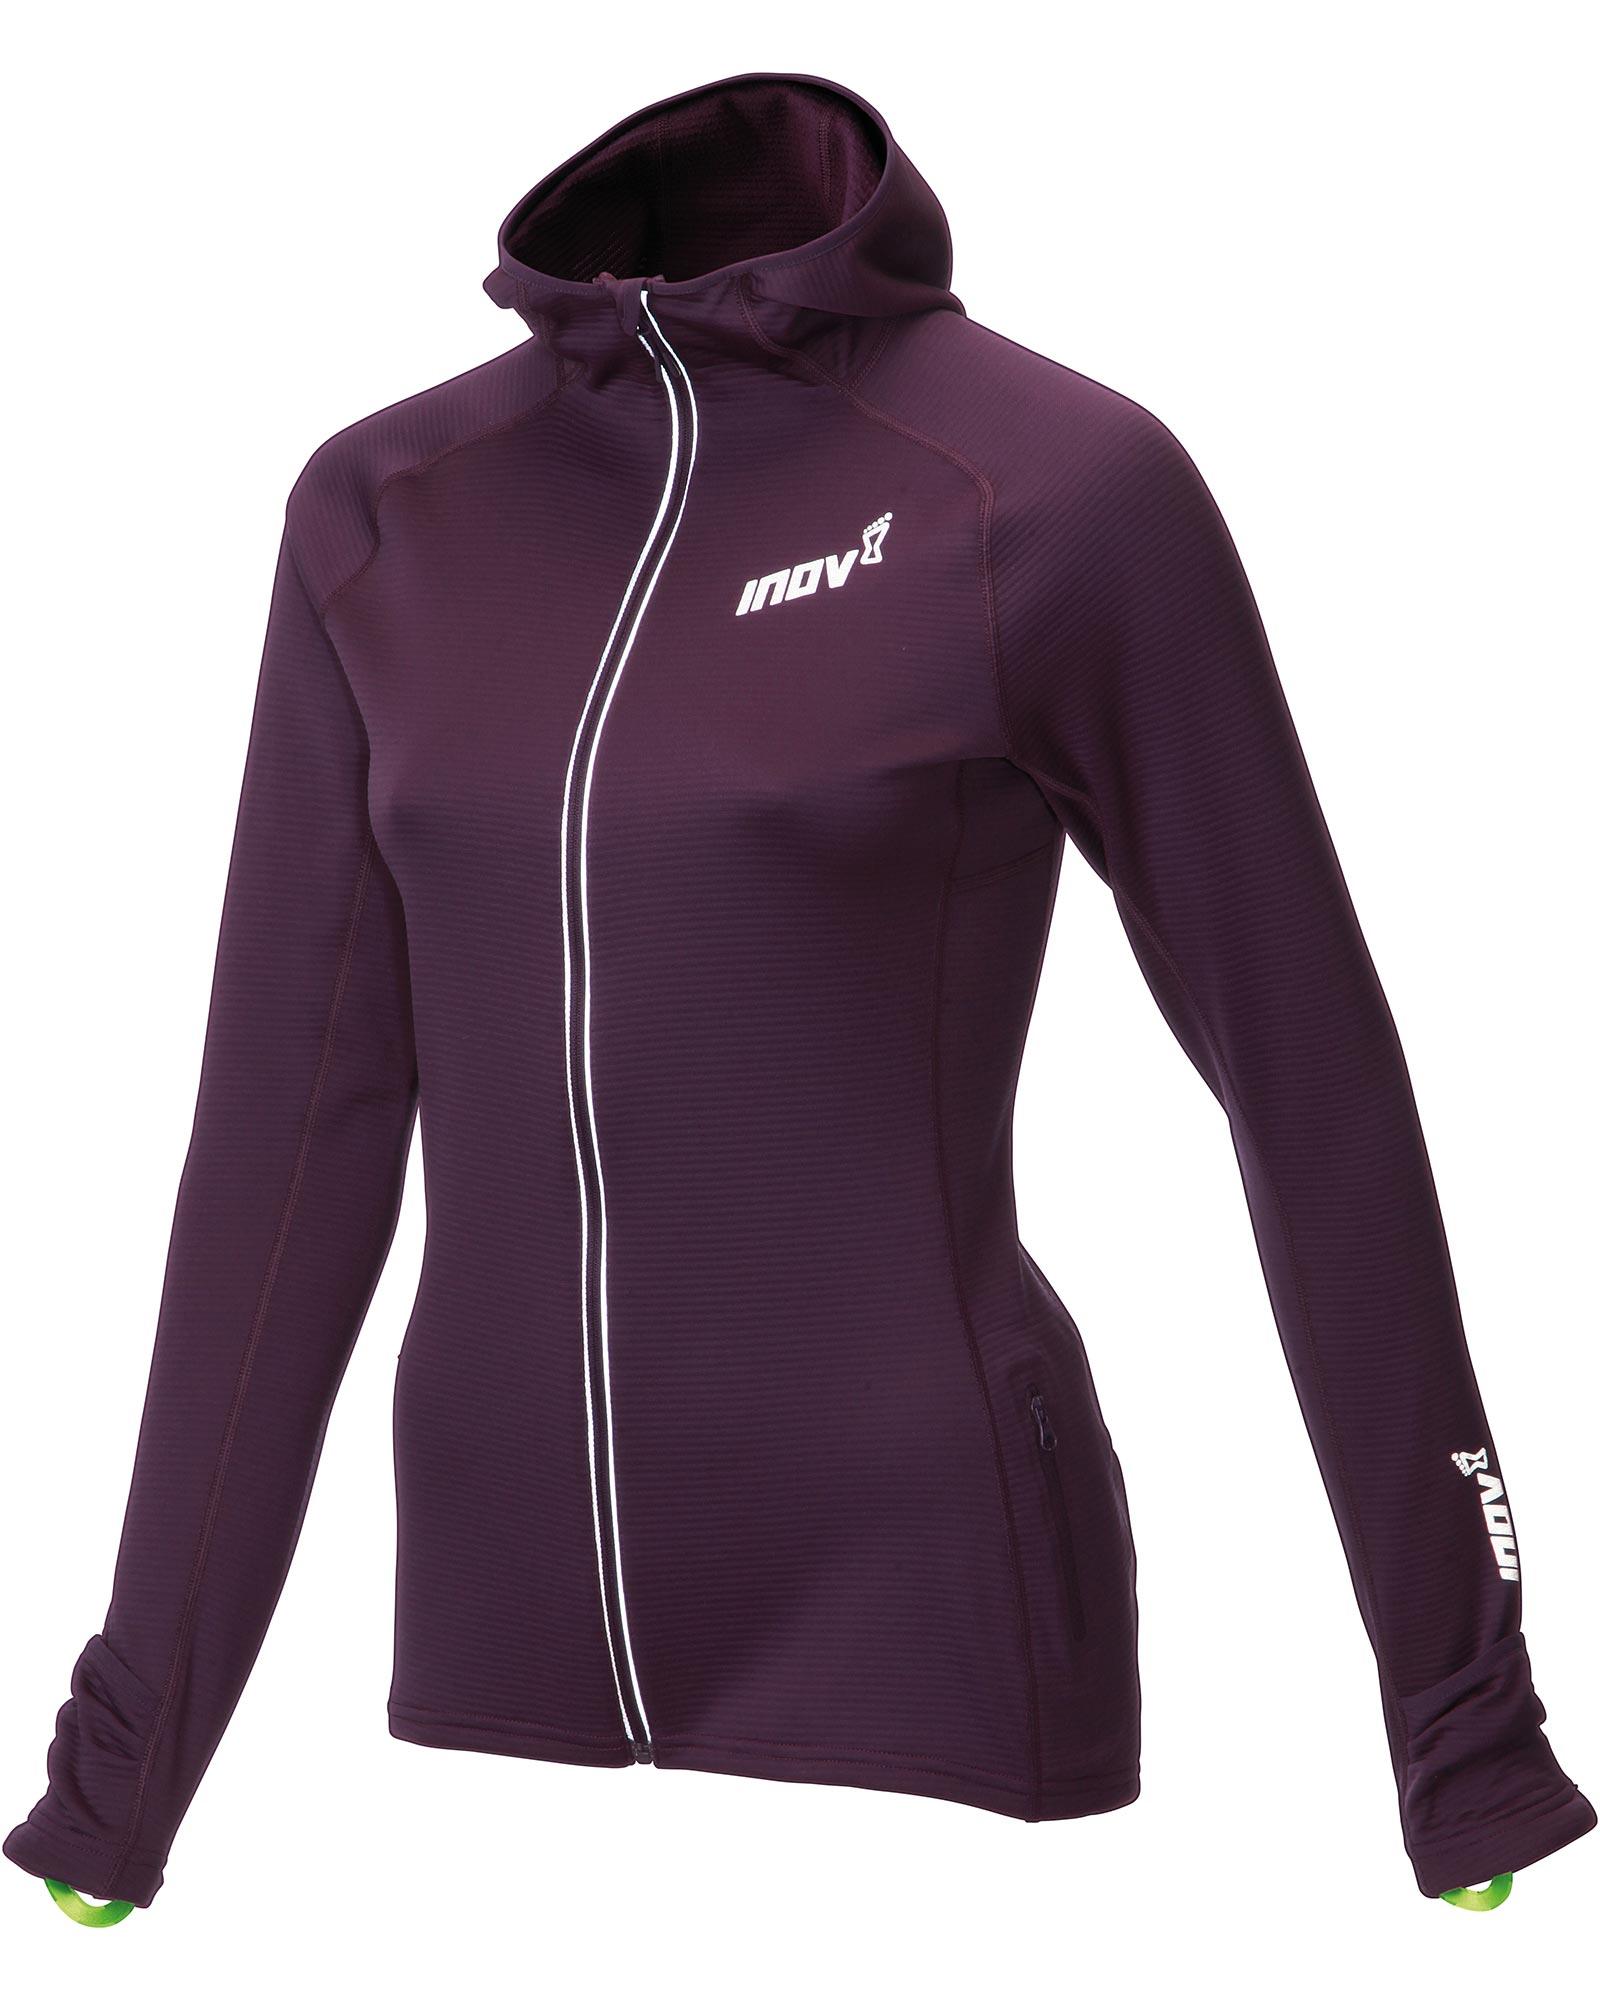 Inov-8 Women's Technical Mid Full Zip Hoodie 0